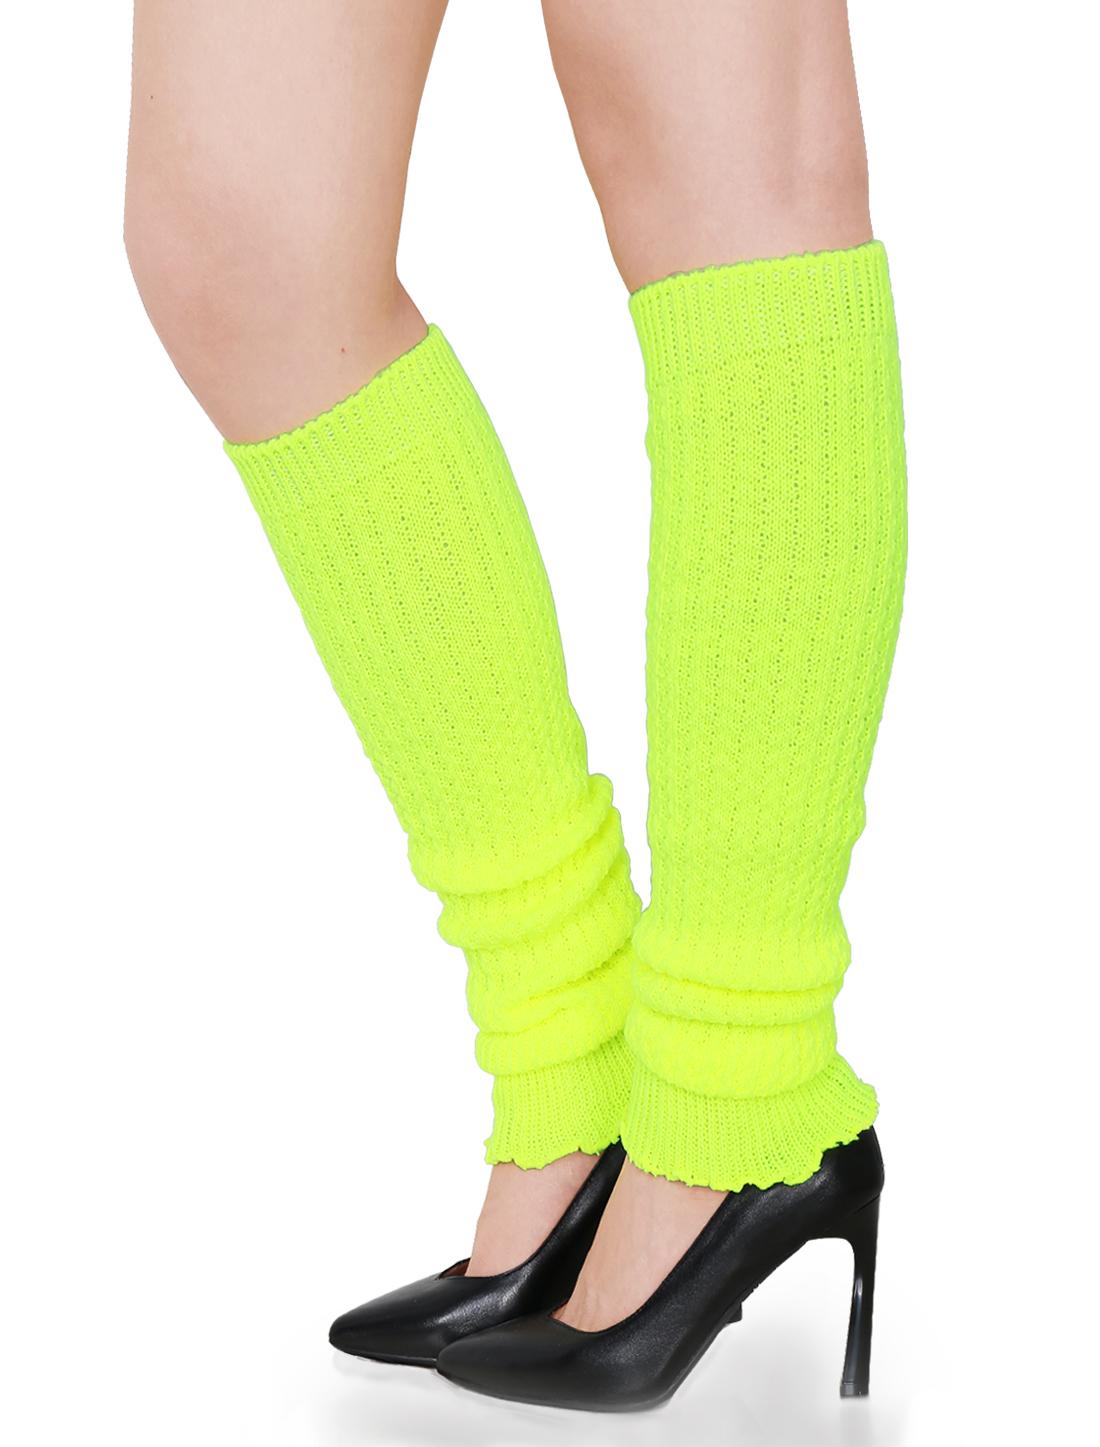 Women Toeless Design Ruffled Cuff Over Knee Knitted Leg Warmers Yellow